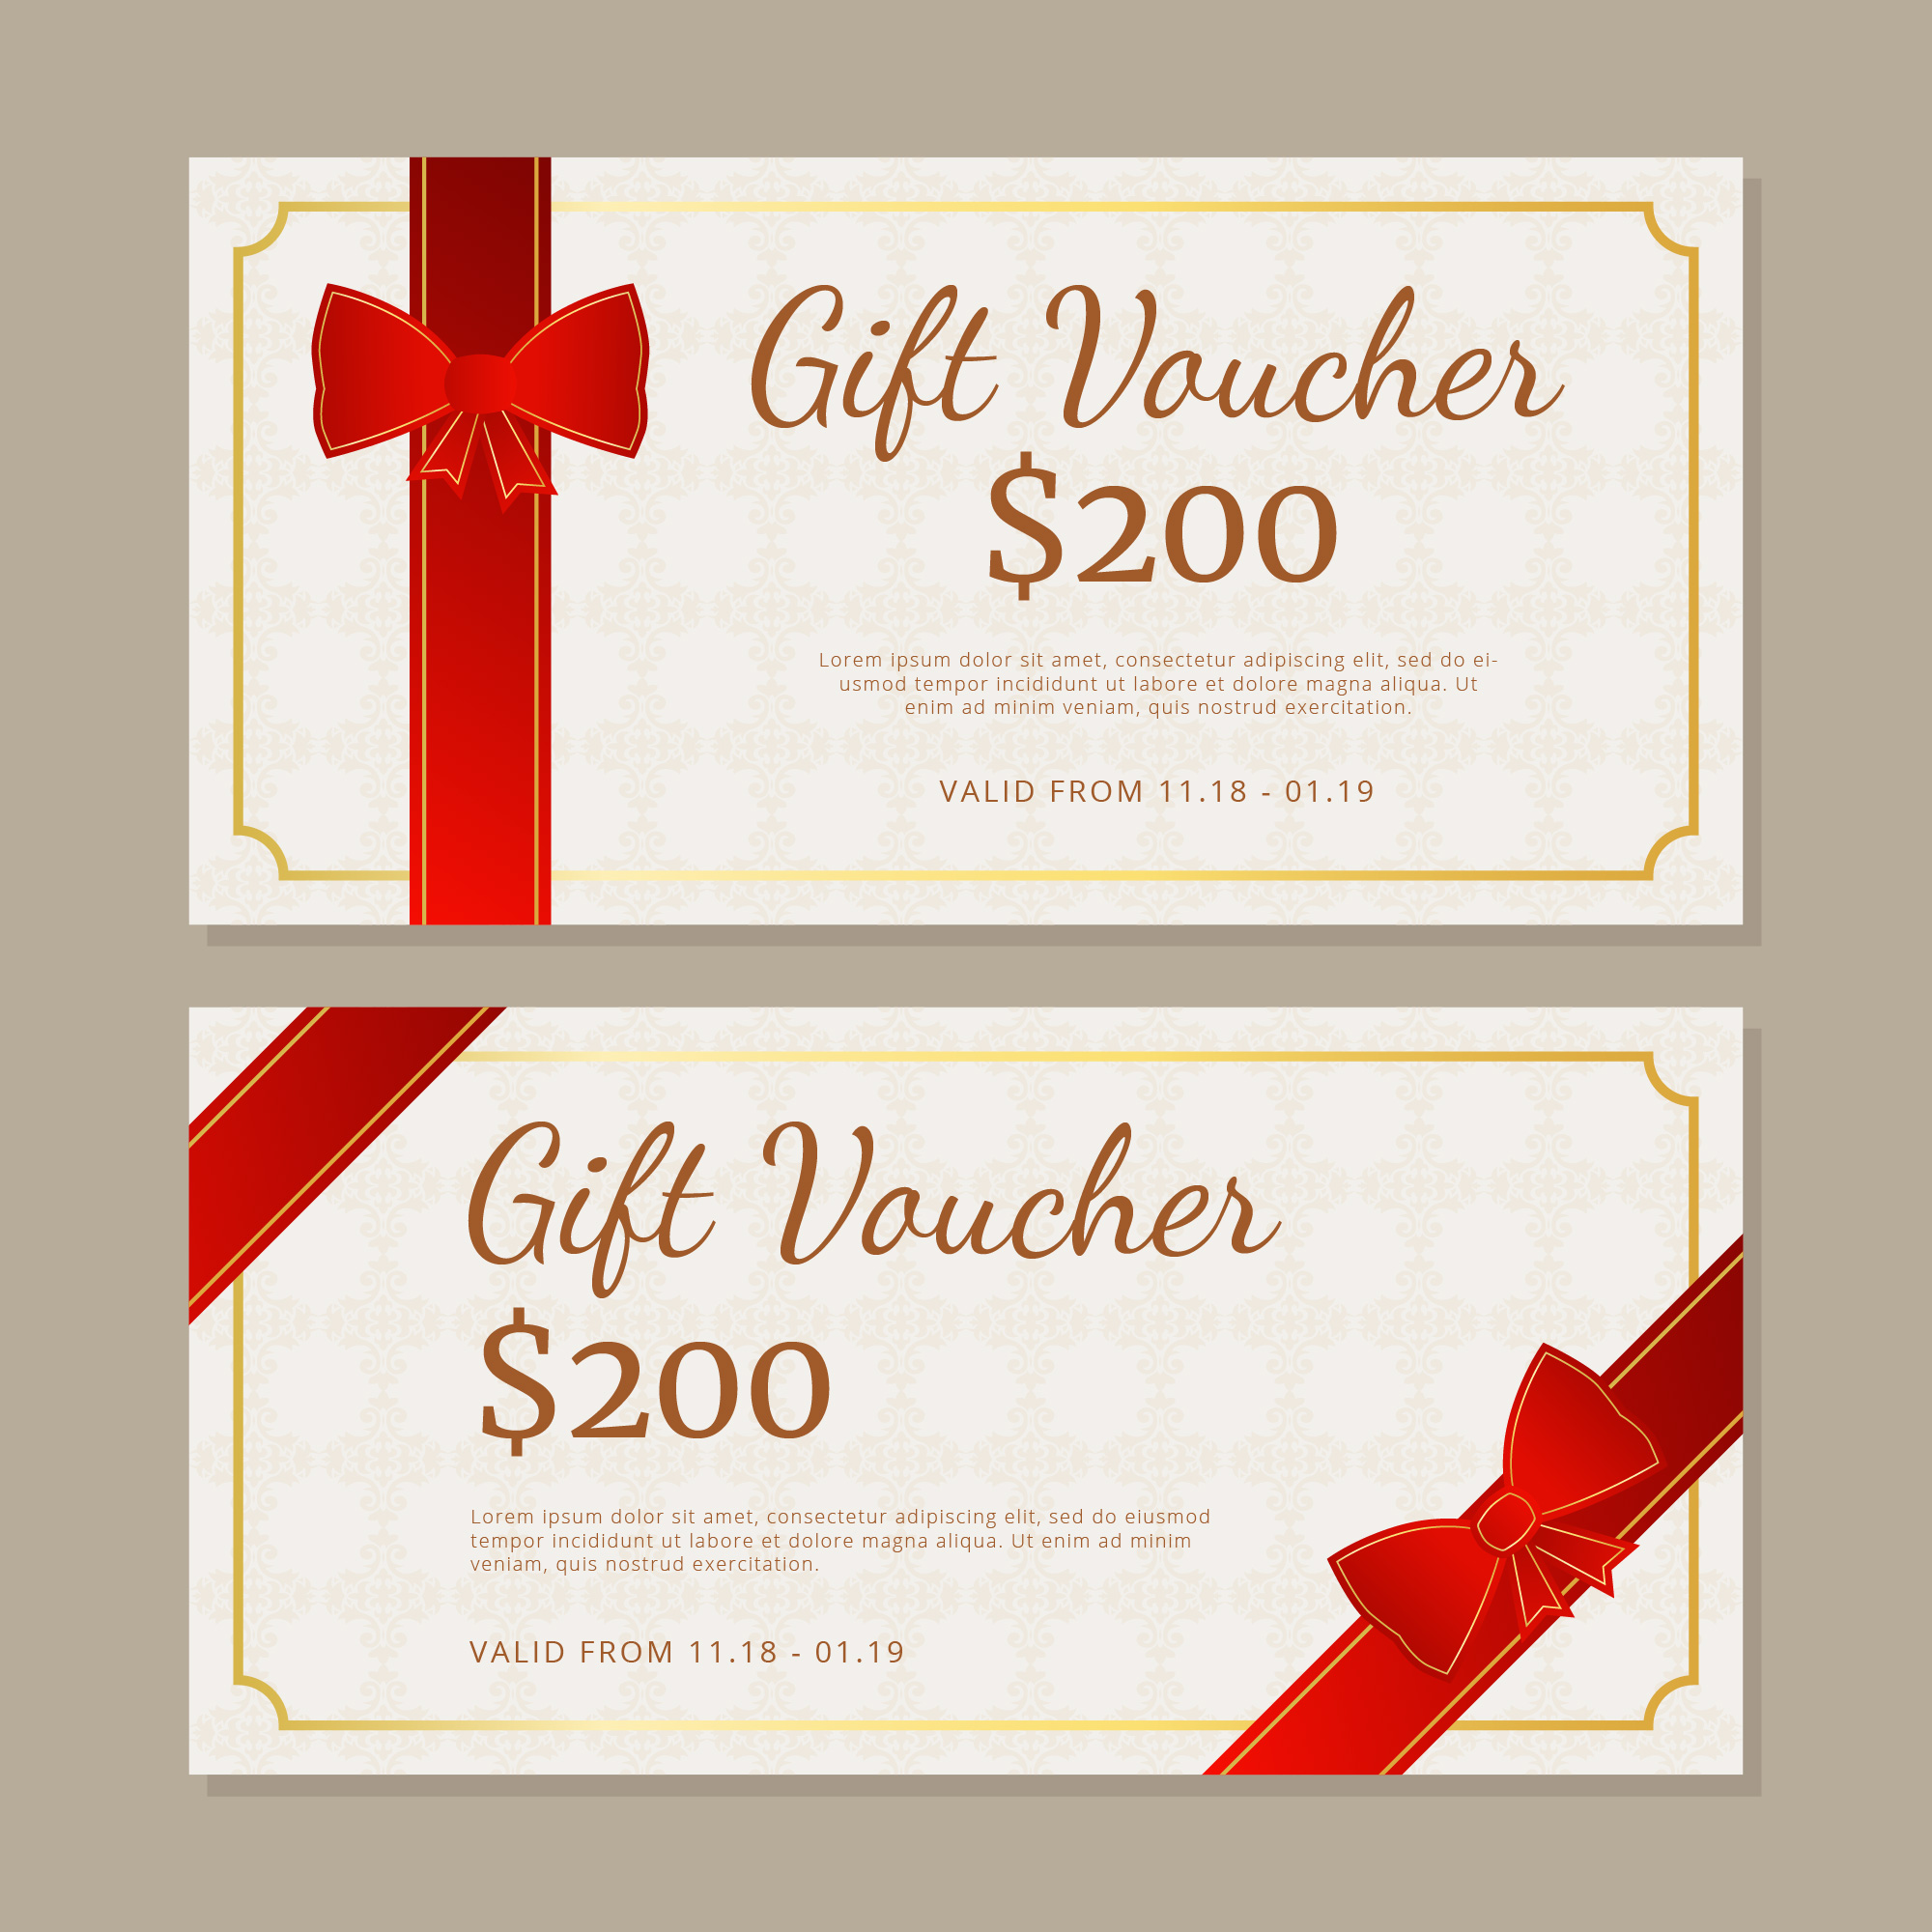 Gift Certificate Free Vector Art